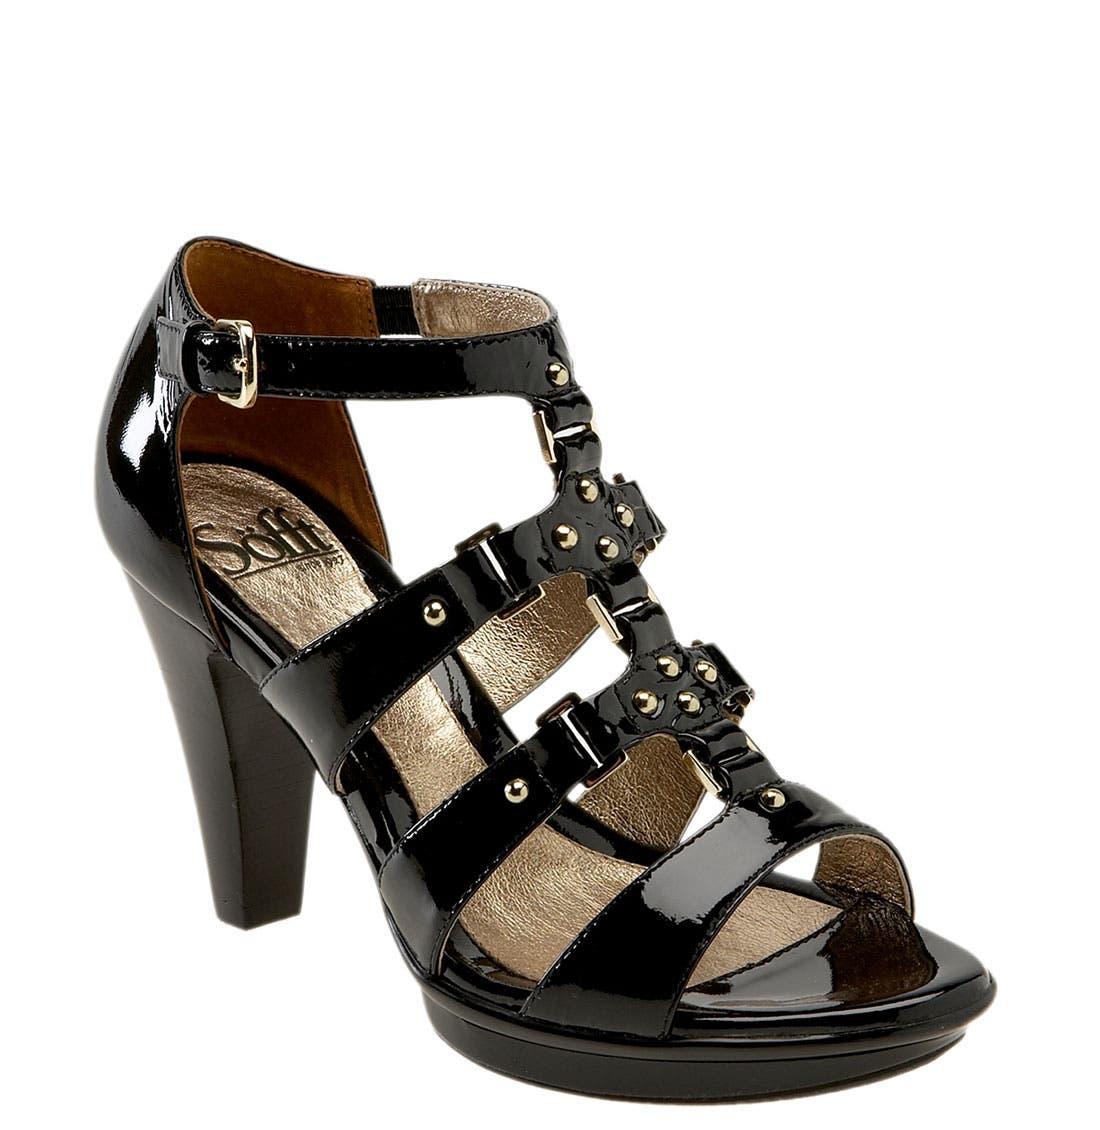 Main Image - Söfft 'Rachelle' Sandal